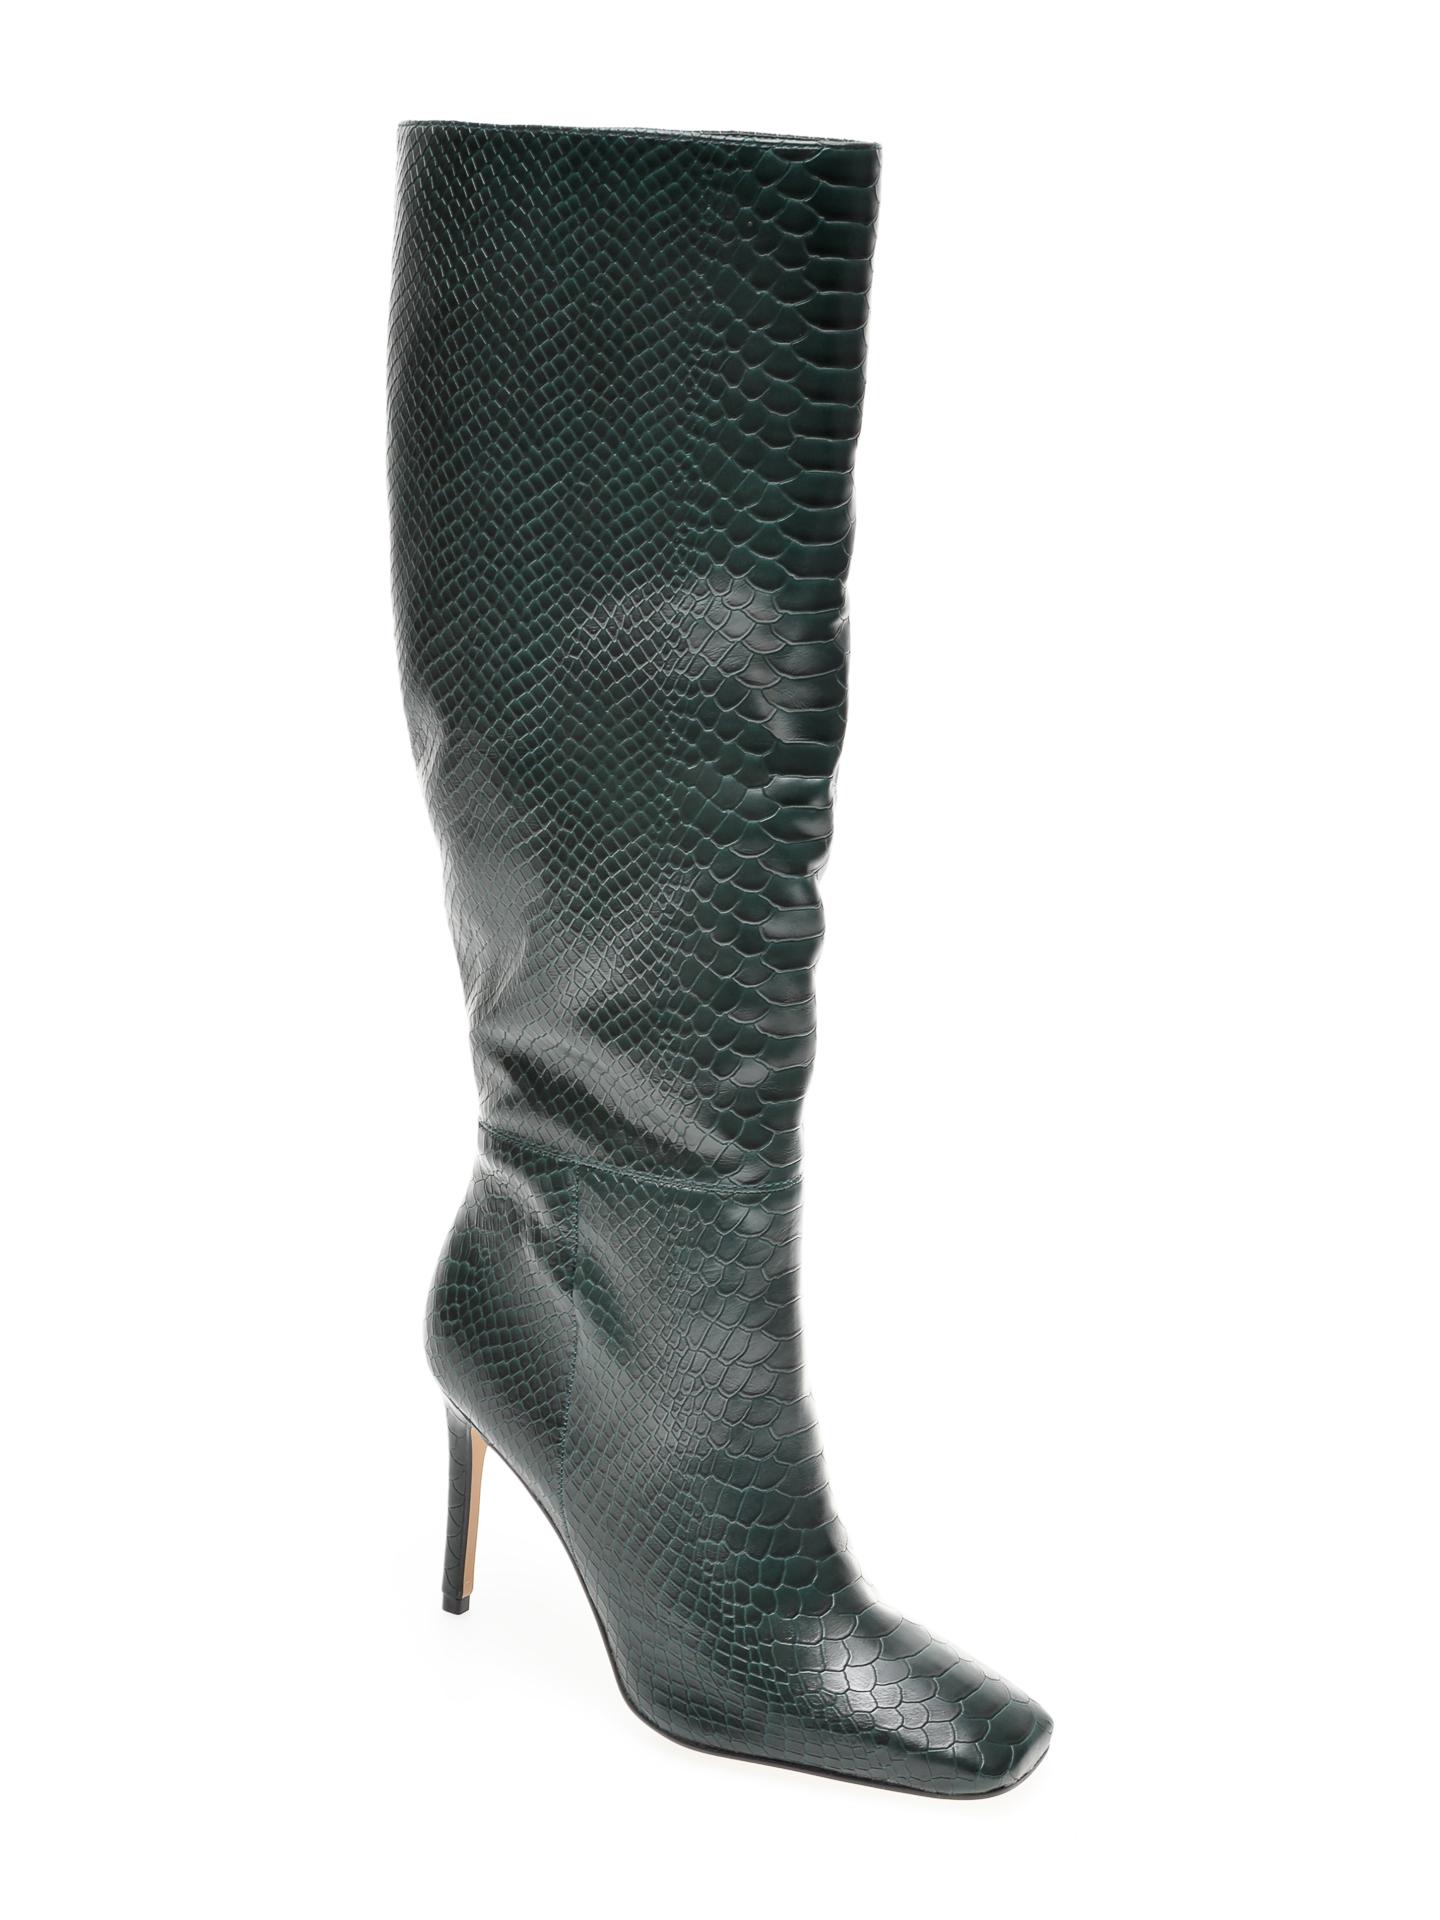 Cizme ALDO verzi, Oluria300, din piele ecologica imagine